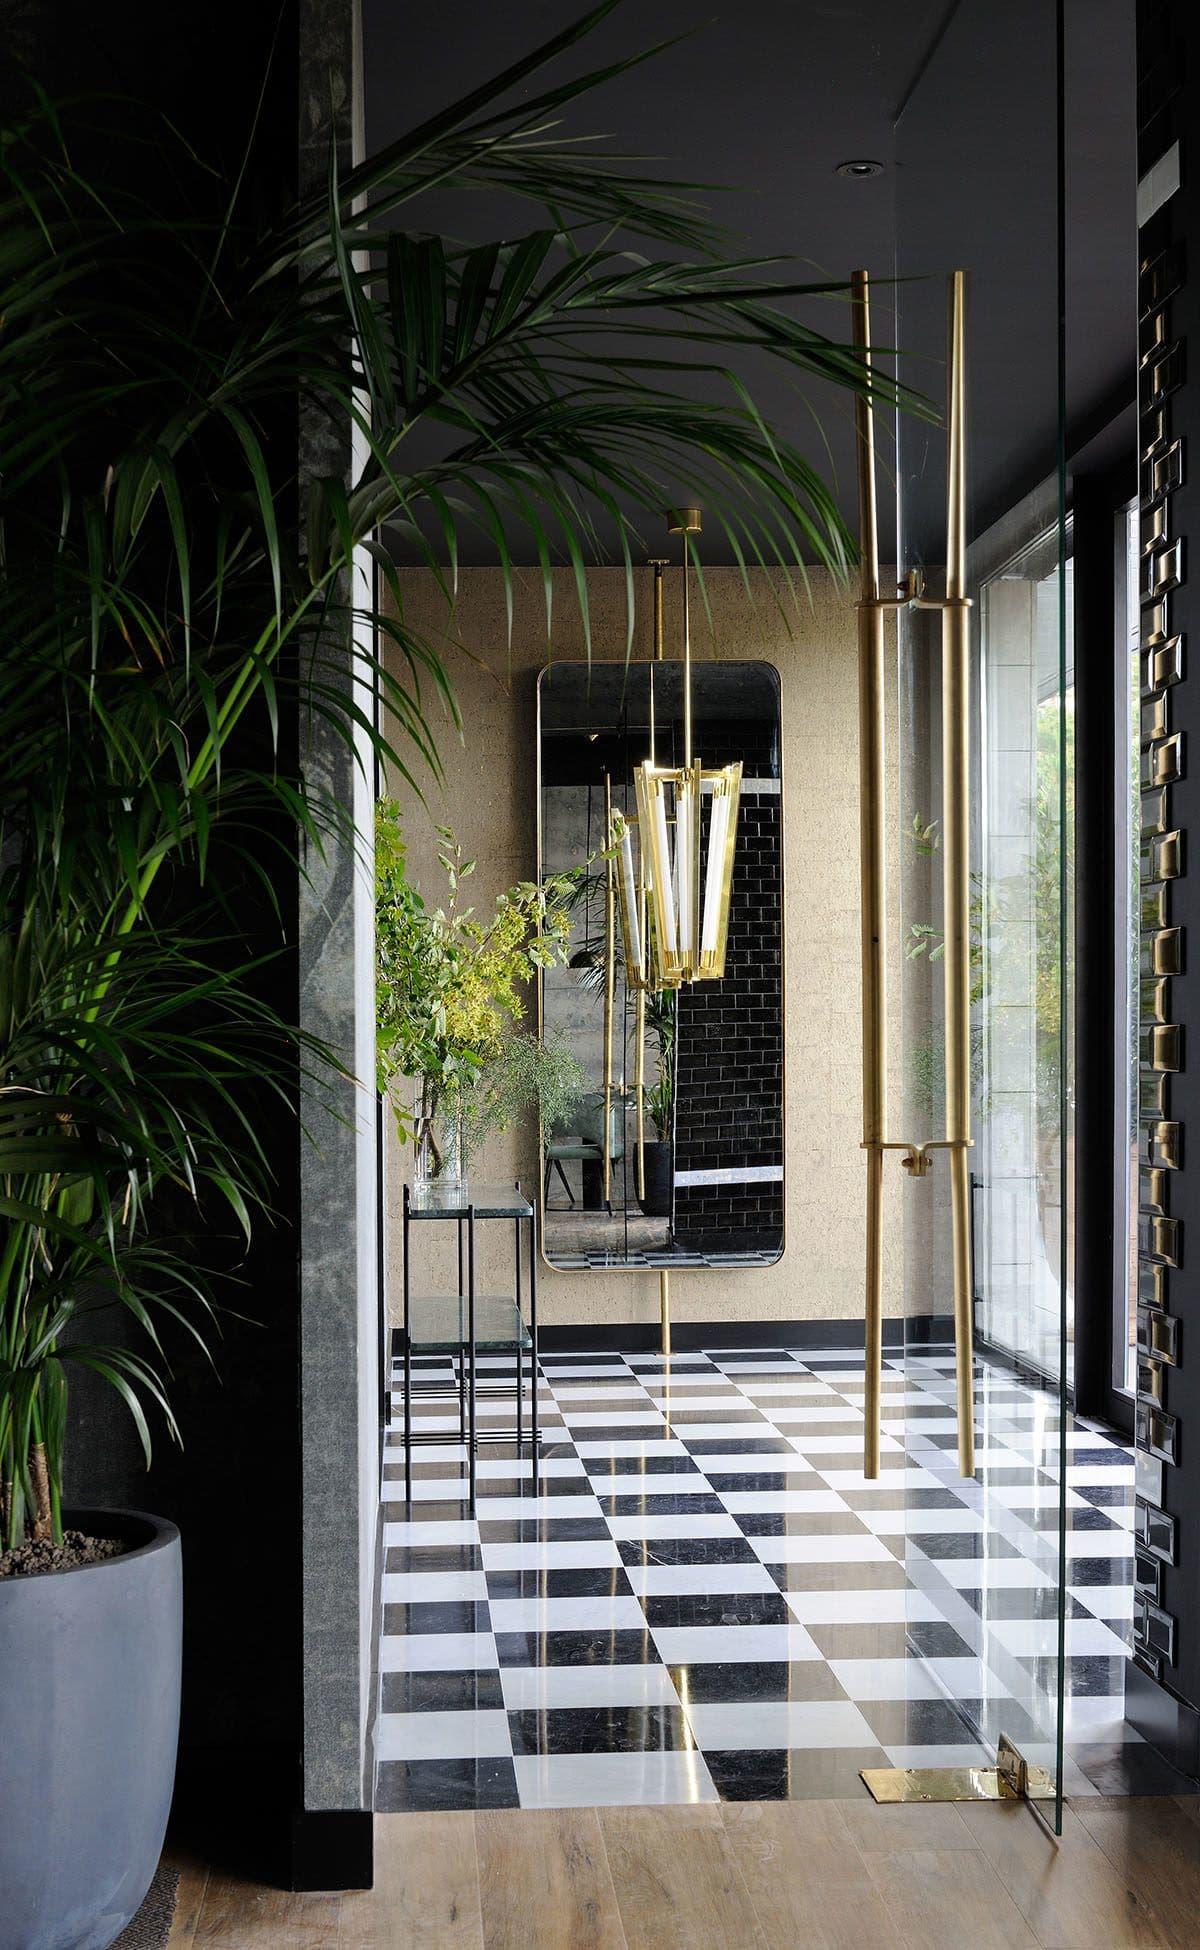 Interior Design by Claude Cartier Decoration seen at La Forêt Noire, Chaponost - Interior Design